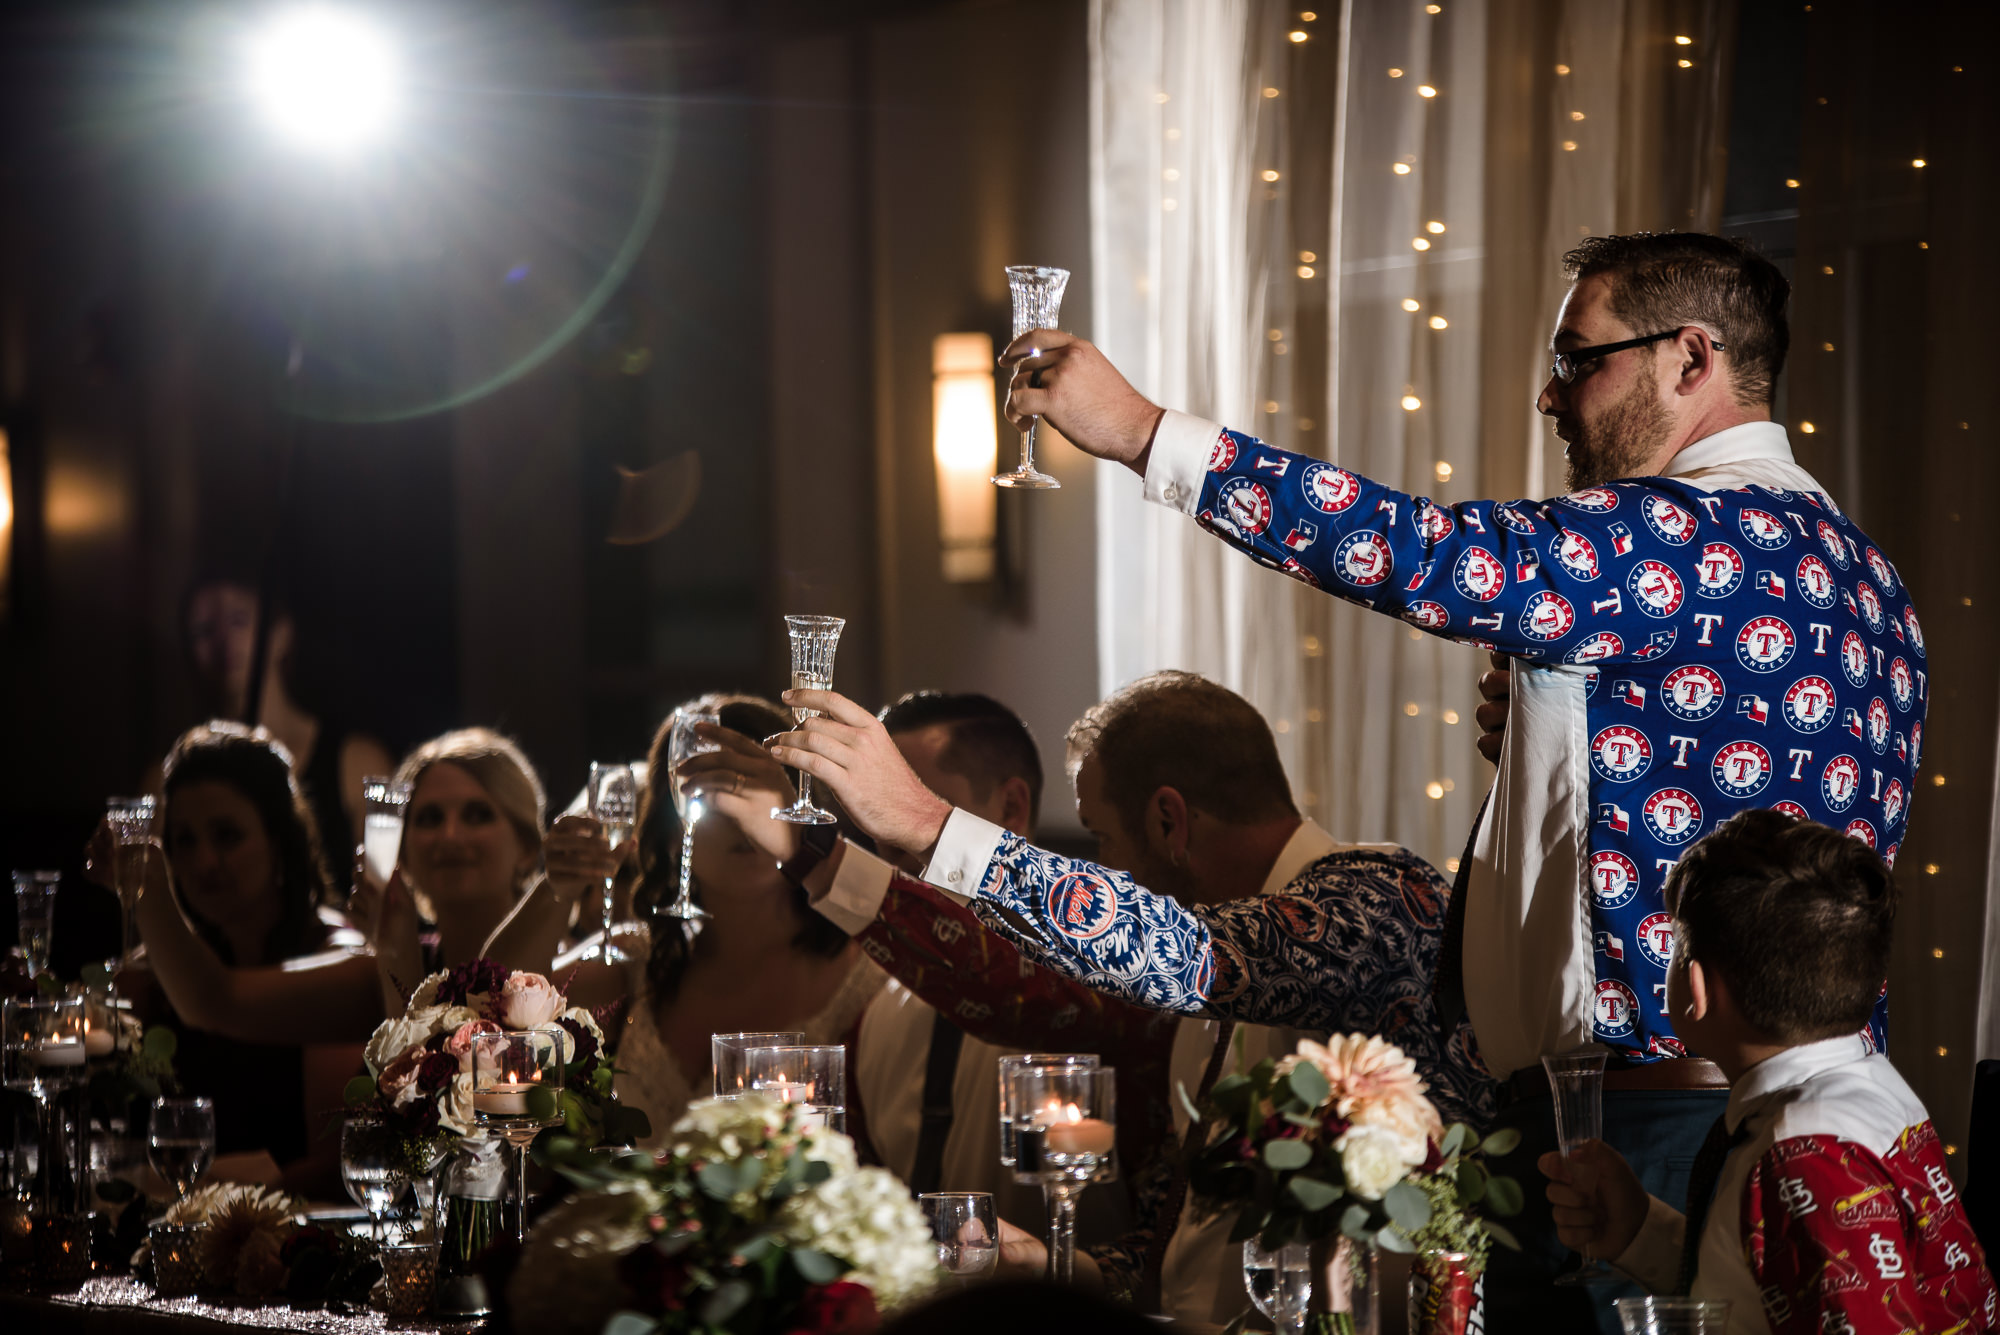 KEVIN-STACY-NOAHS-EVENT-VENUE-OMAHA-WEDDING-PHOTOGRAPHER-026.jpg